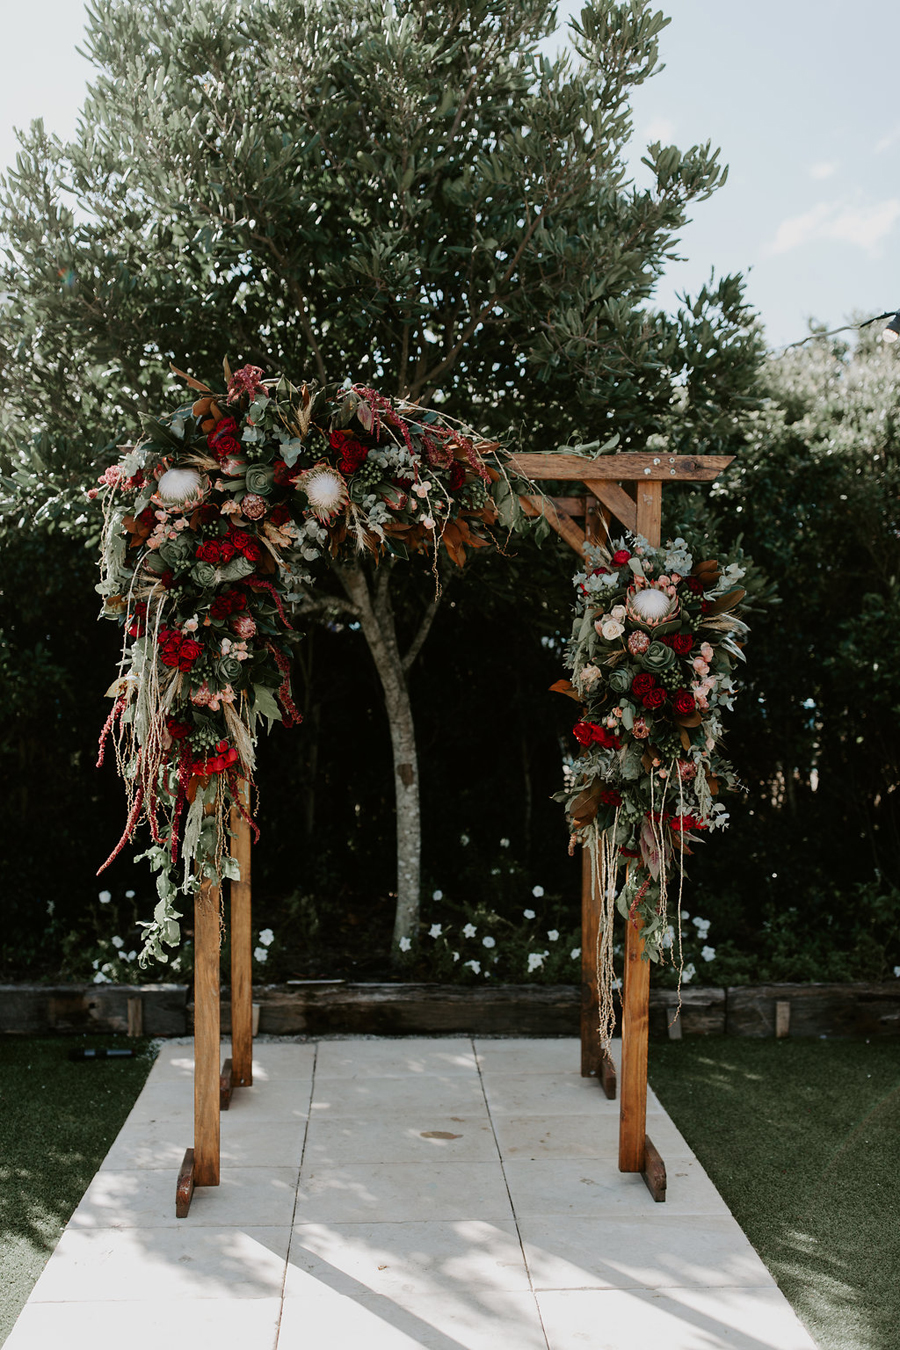 osteria-casuarina-wedding-venue-tweed-coast-weddings-coastal-garden-reception-real-wedding010.jpg